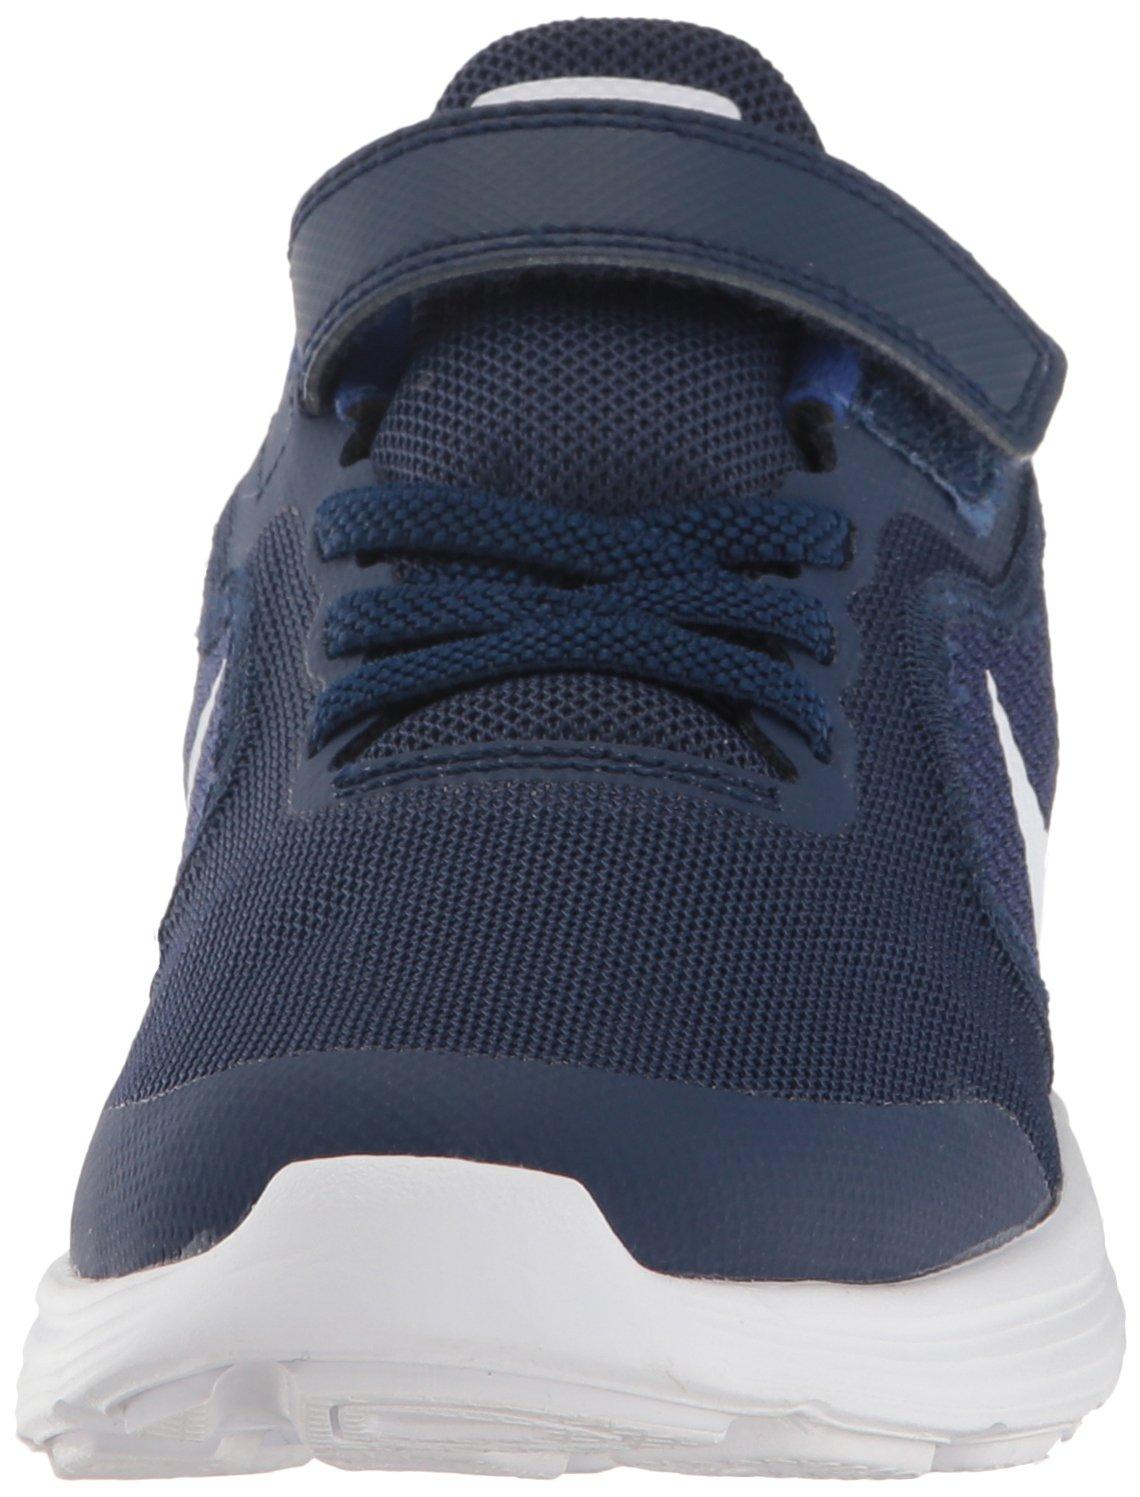 747aea5a0ae7 Nike - Revolution 3 Psv - 819414406 - Color  Azul marino-Blanco-Negro -  Size  28.5  Amazon.es  MainApps  Libros